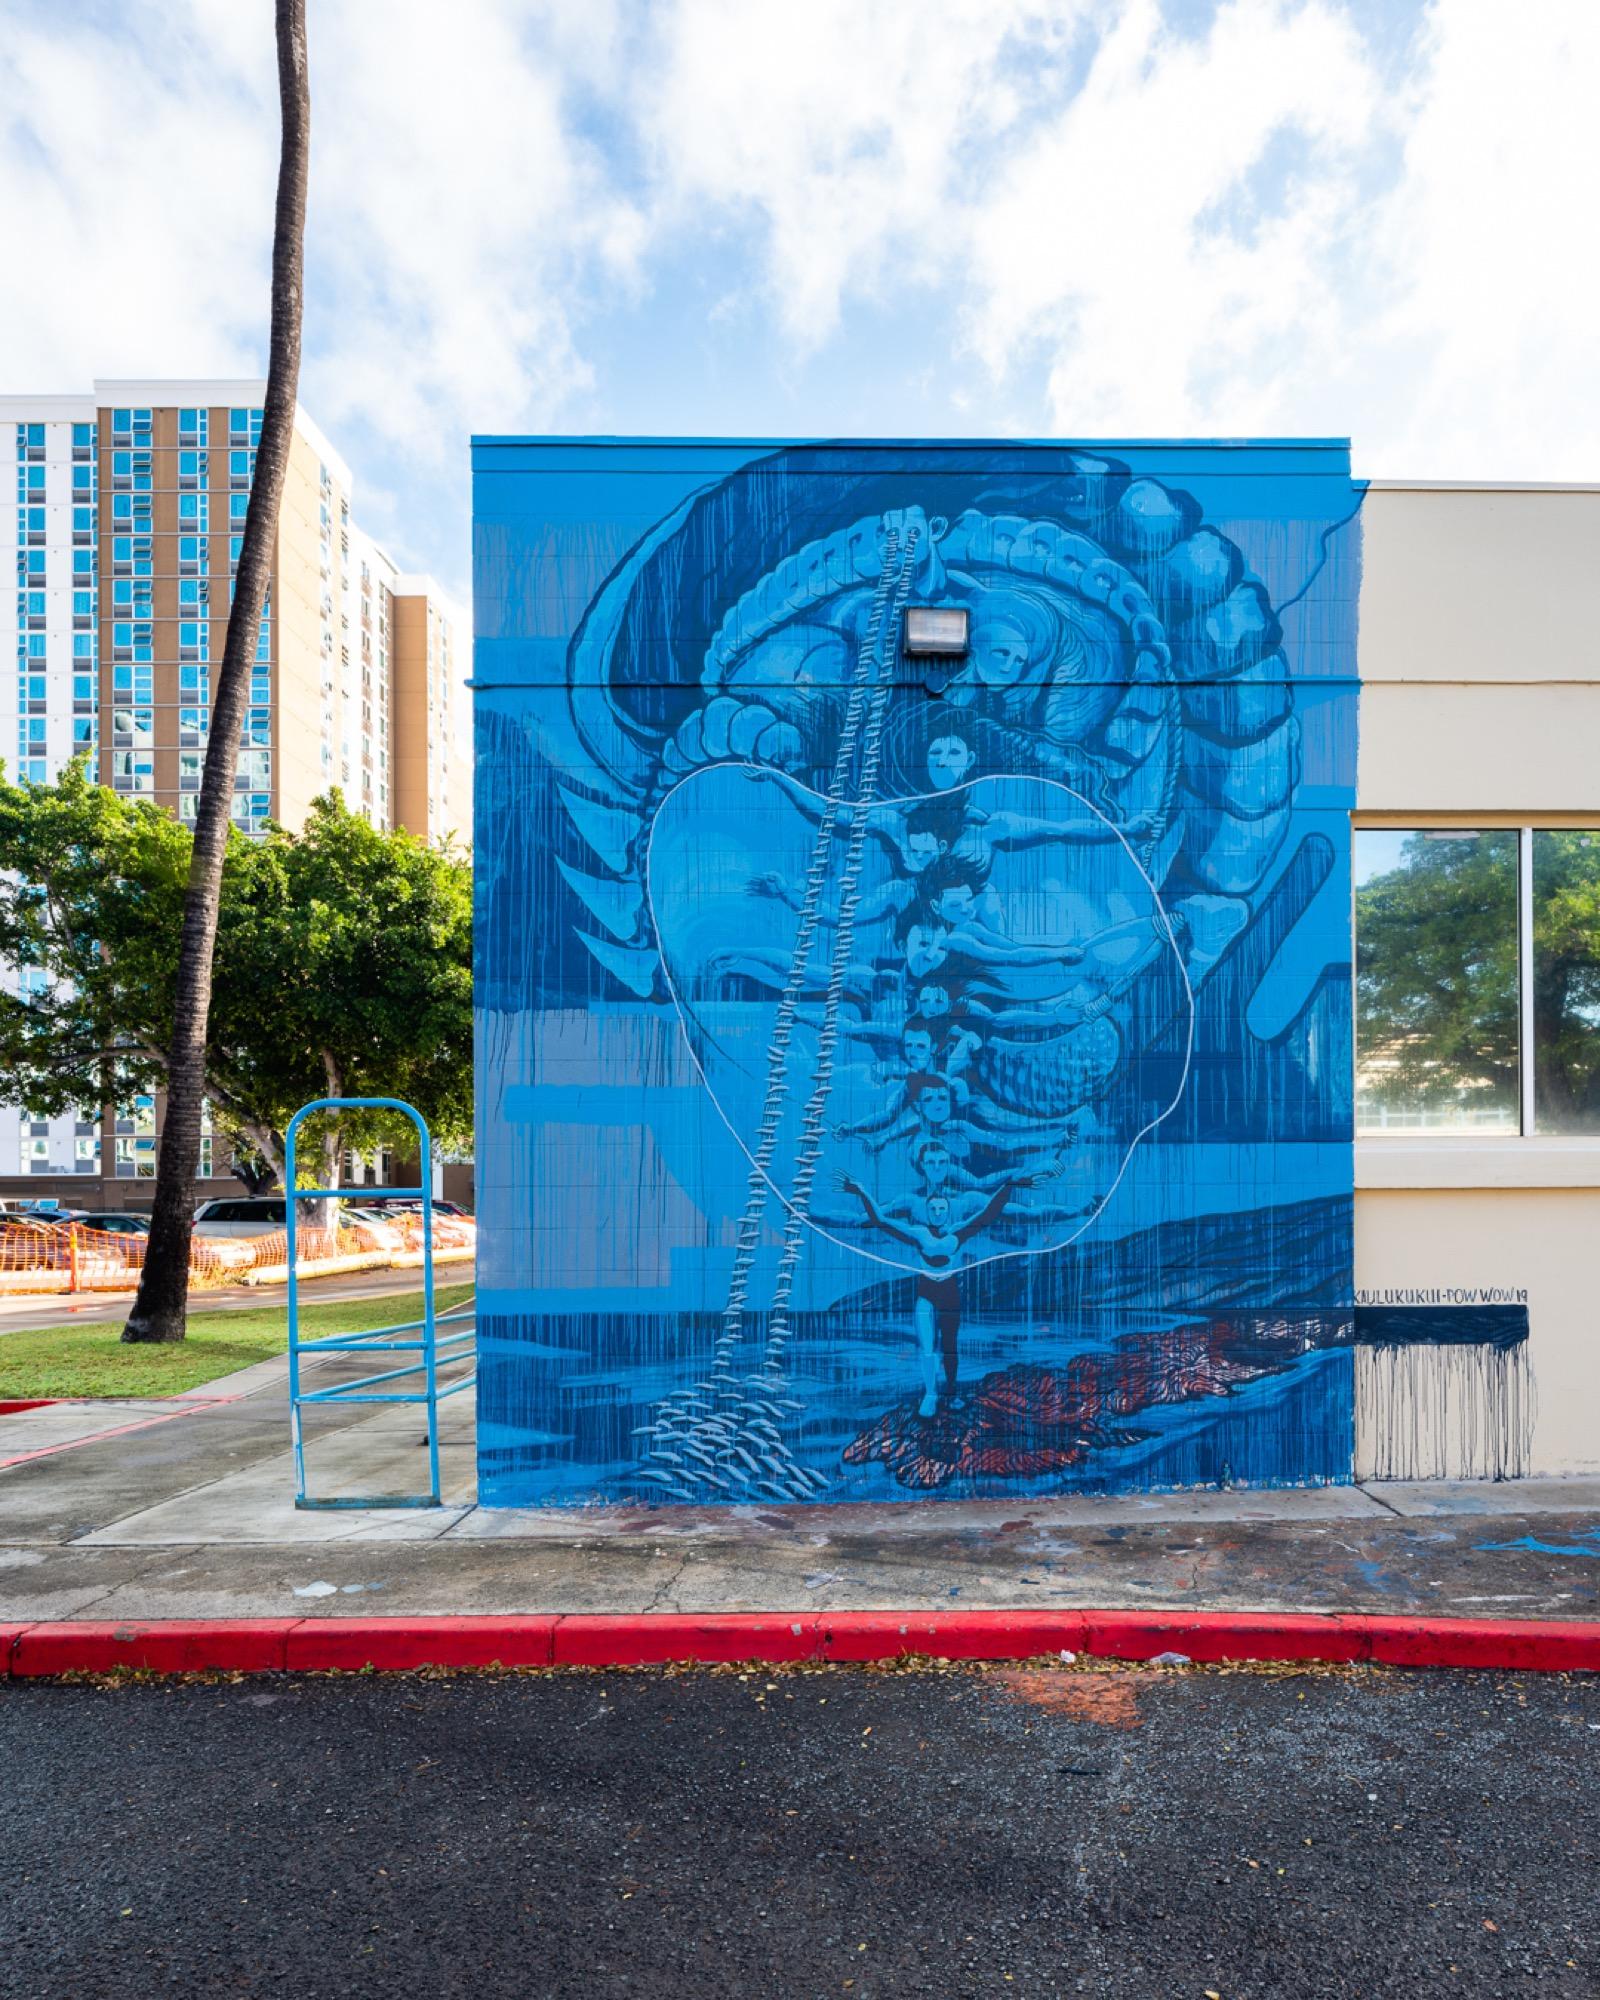 Recap: POW! WOW! Hawaii 2019 Artes & contextos pwh2019 KaiKaulukukui bshigeta